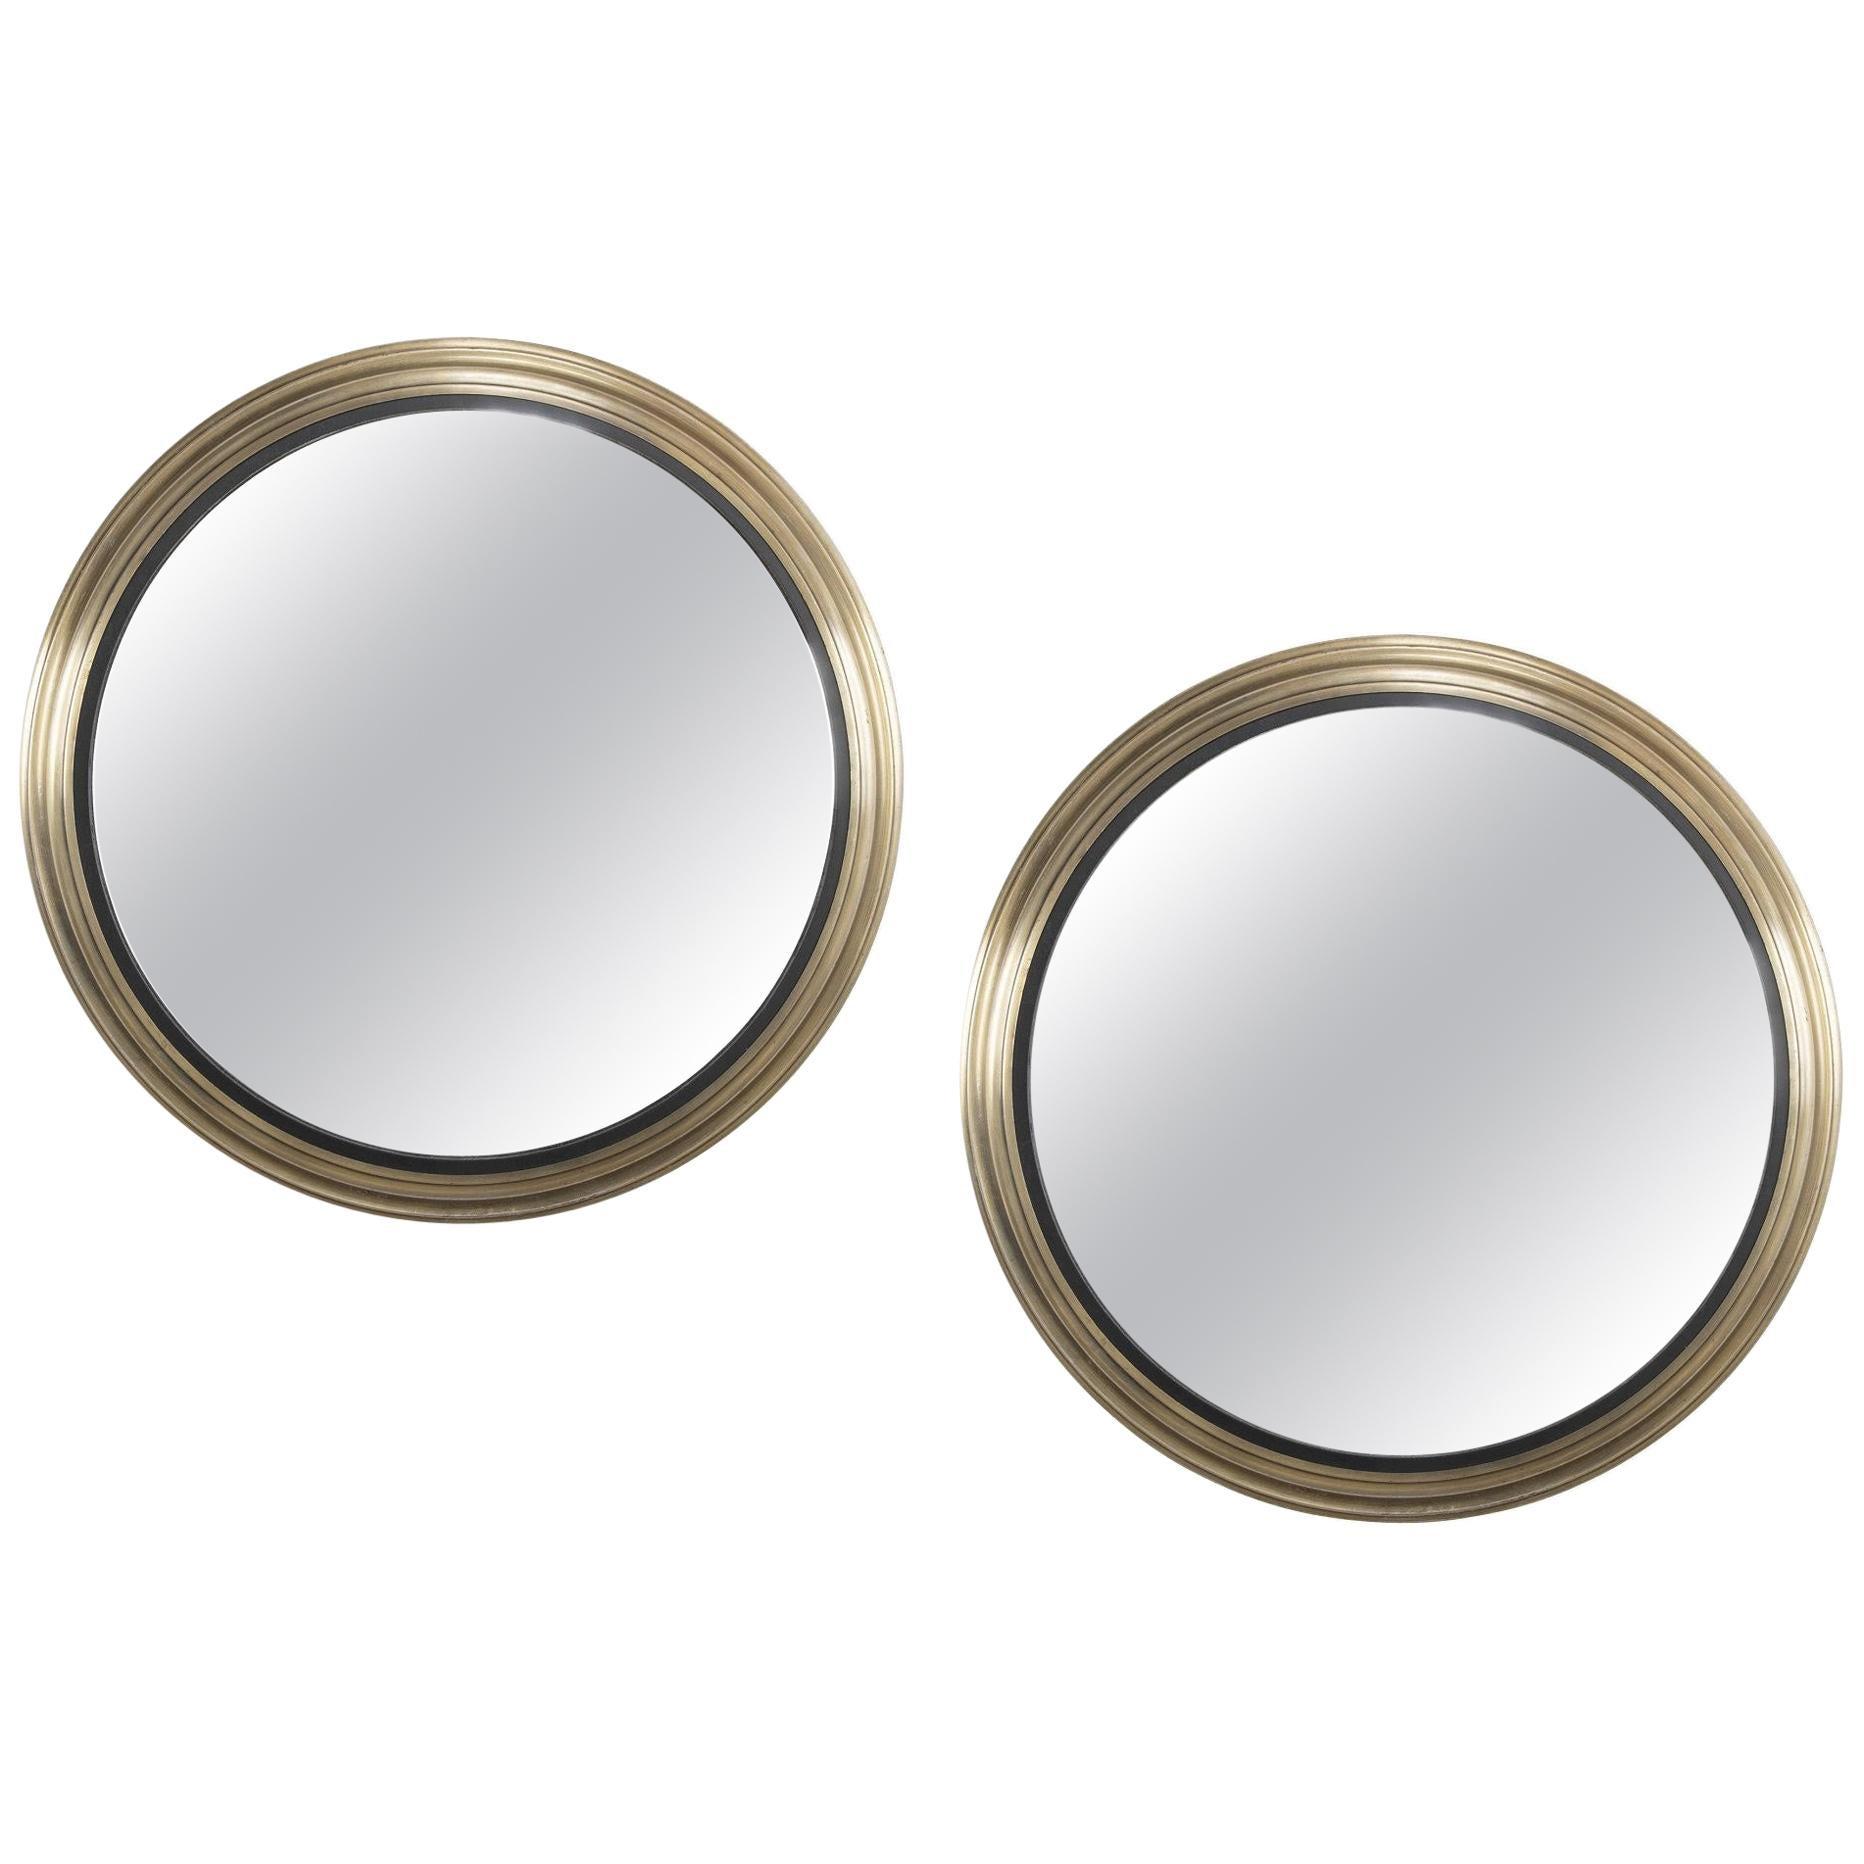 Pair of Monumental 20th Century Steel Frame Convex Mirrors